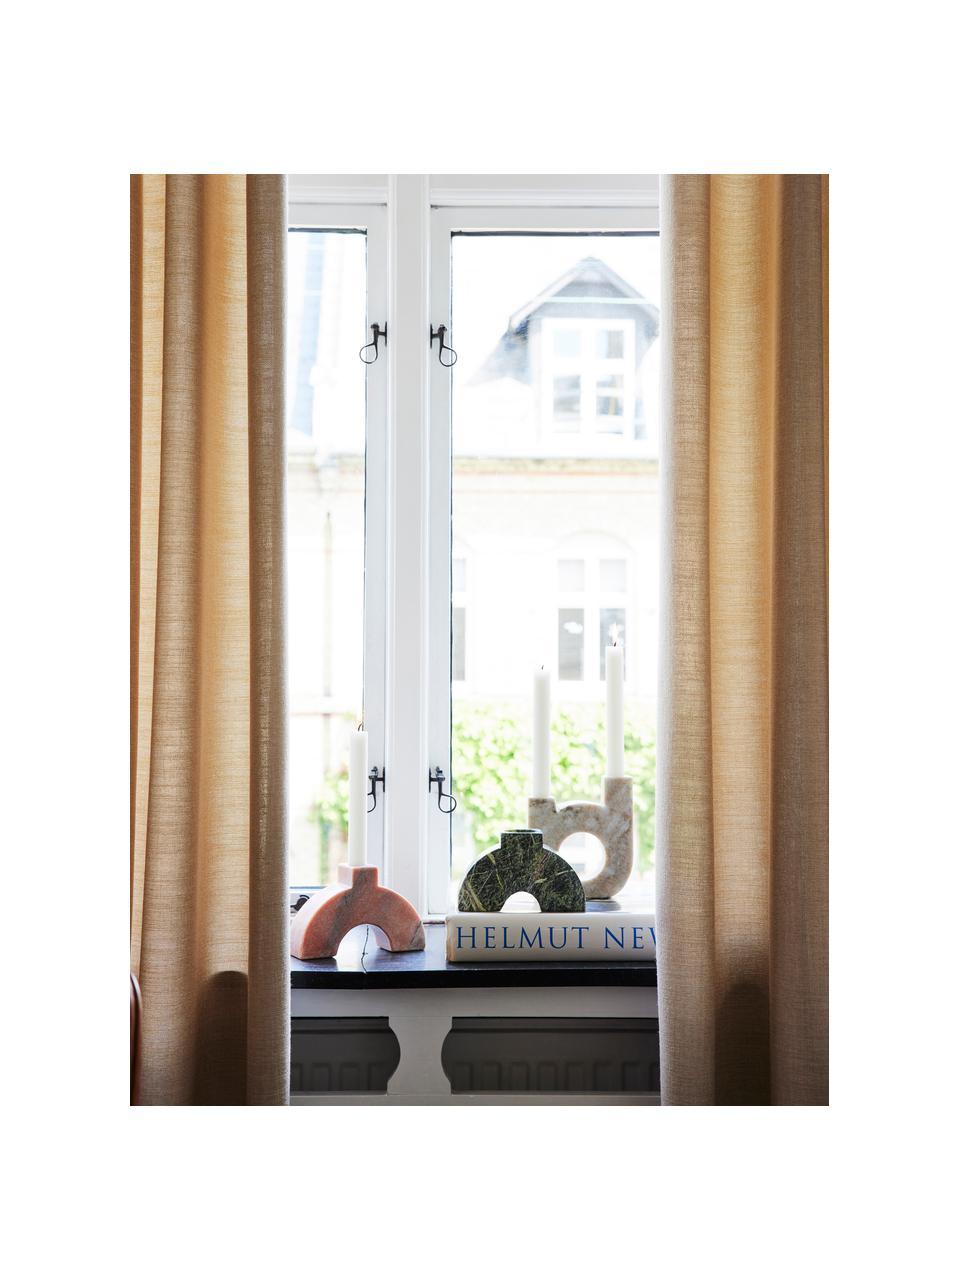 Kerzenhalter Arch Thin aus Marmor, Marmor, Beige, Rosa, 16 x 13 cm